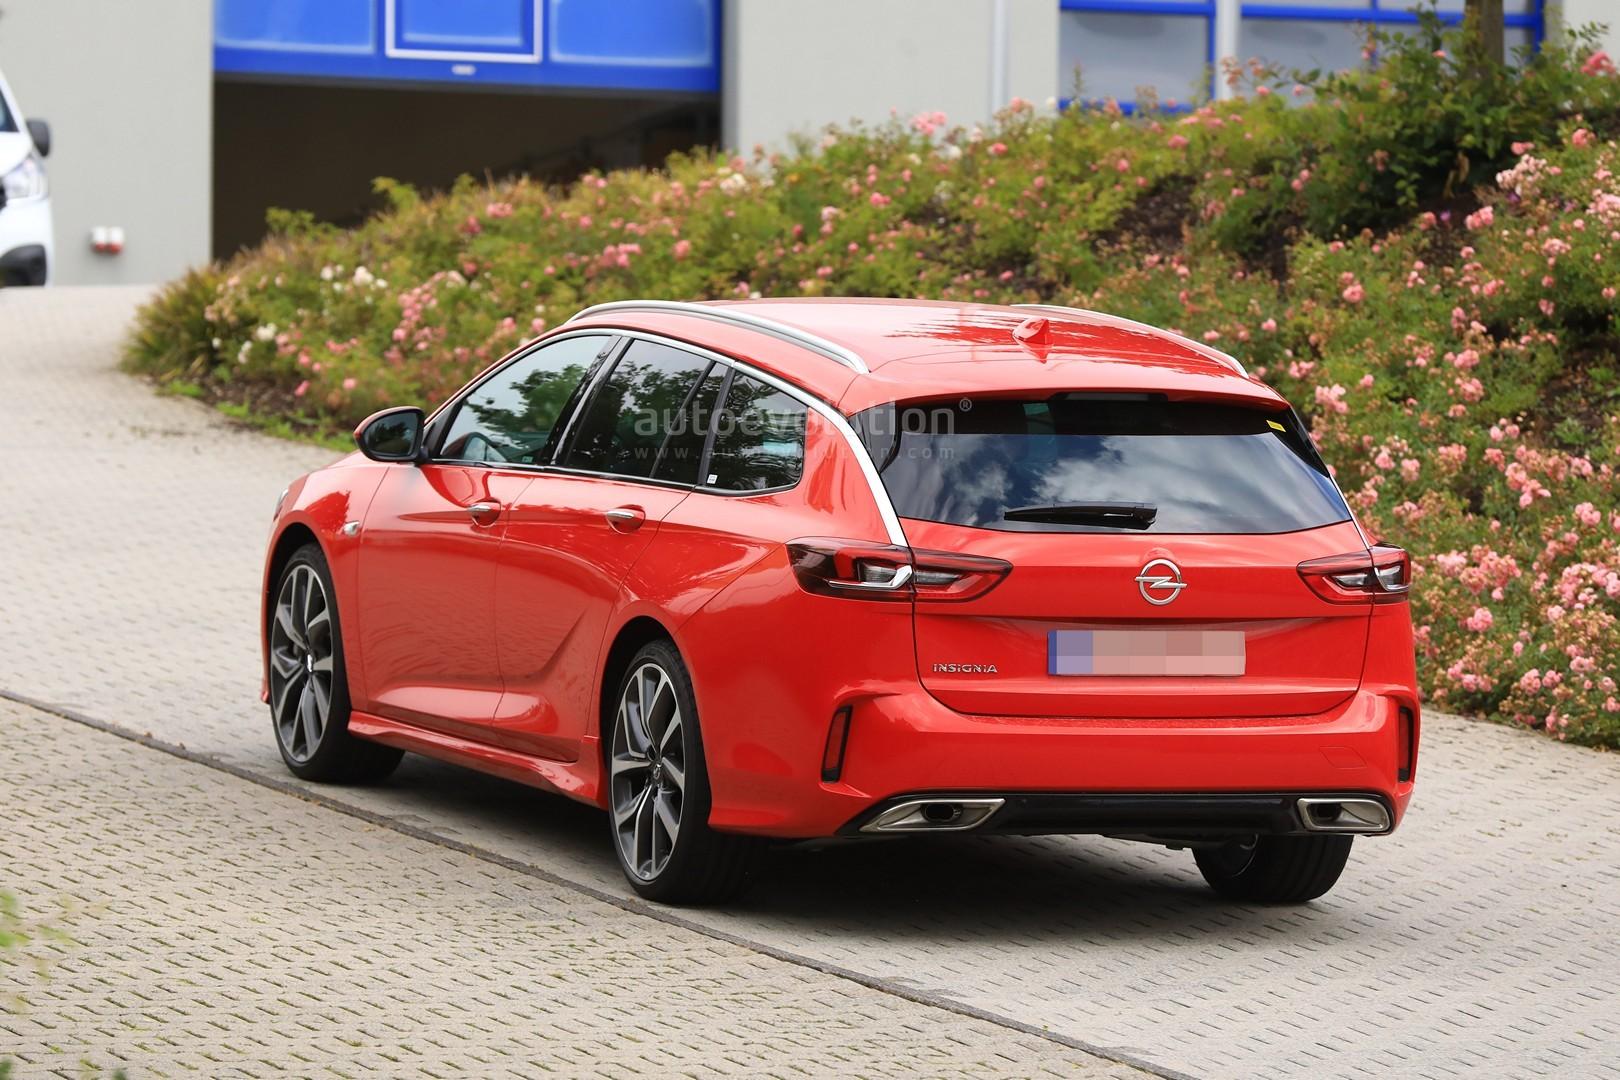 Opel Insignia Opc 2018 >> Spyshots: 2018 Opel Insignia GSi Wagon Drops Disguise - autoevolution